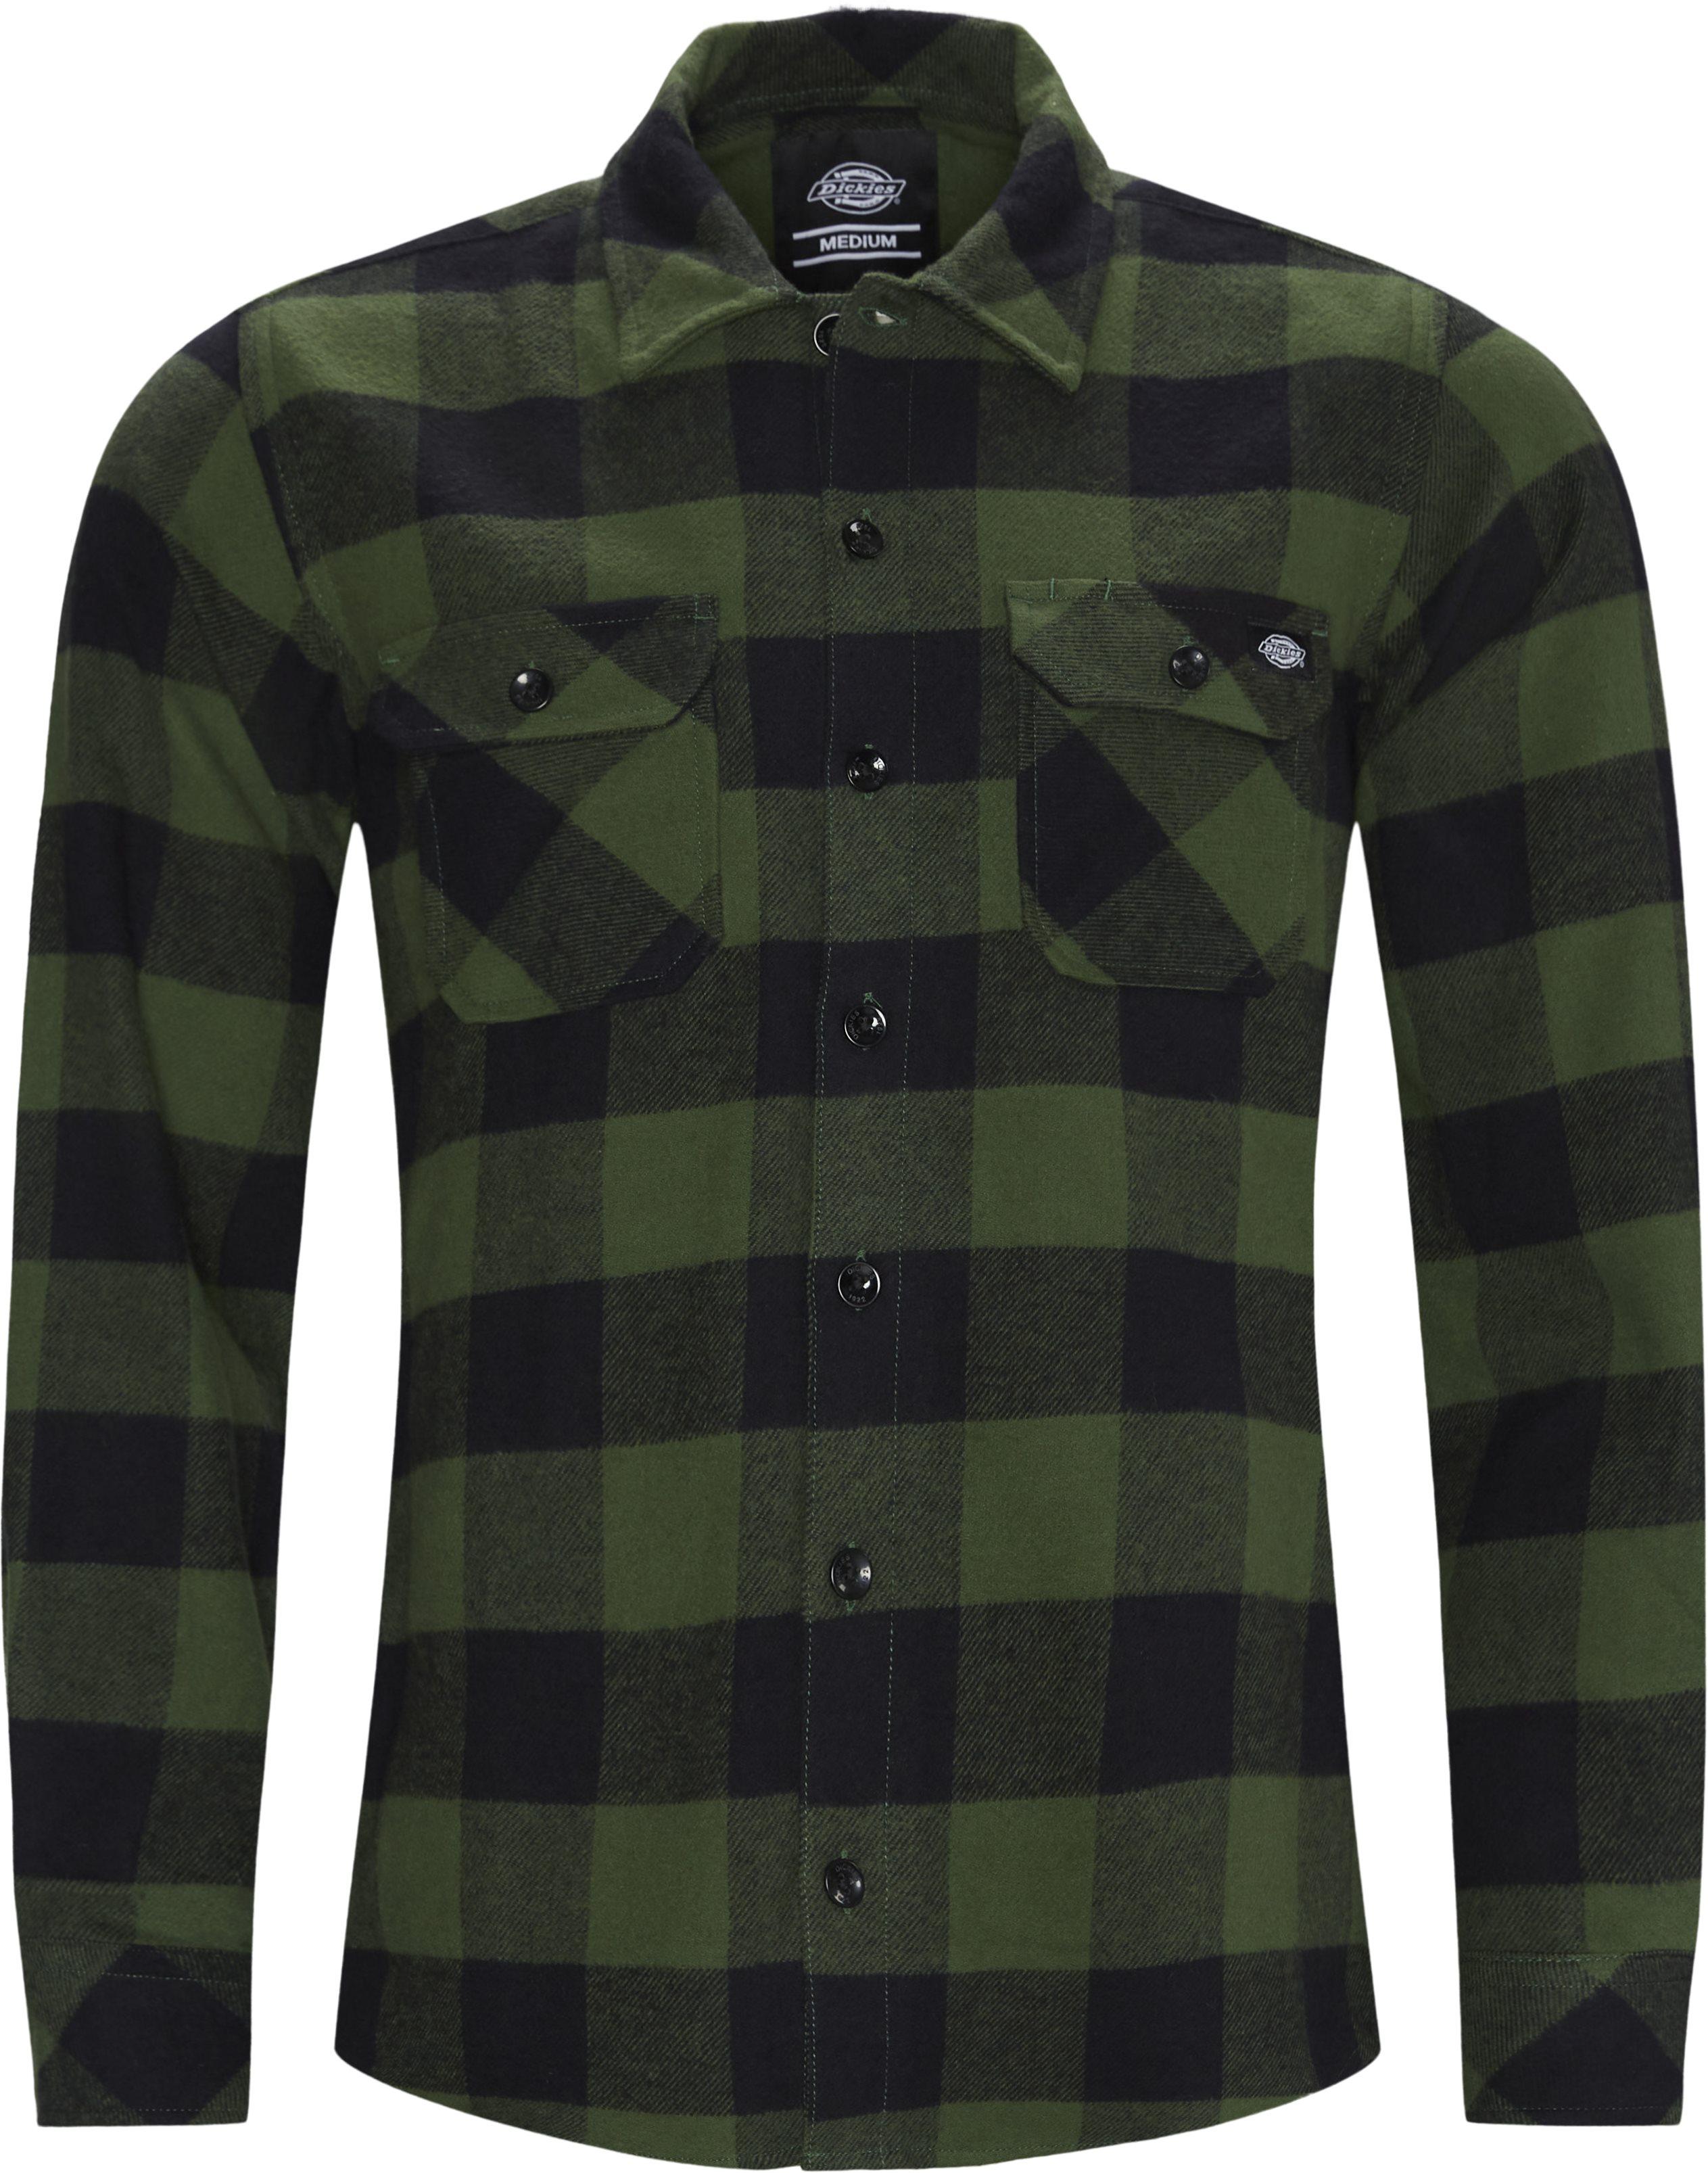 Shirts - Regular - Green